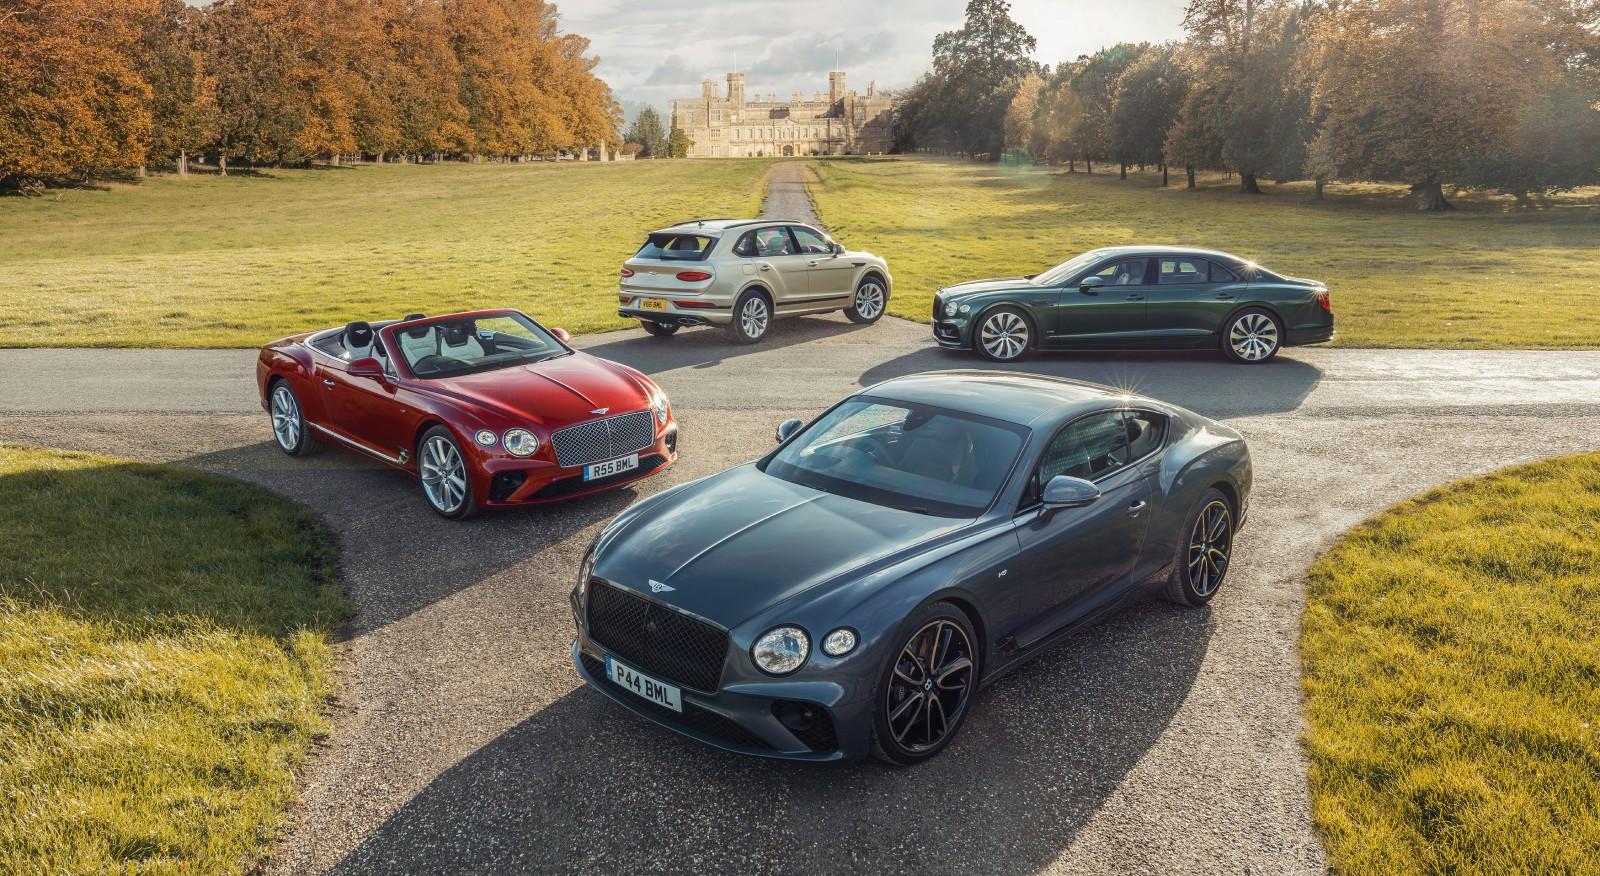 Bentley catálogo de coches de lujo